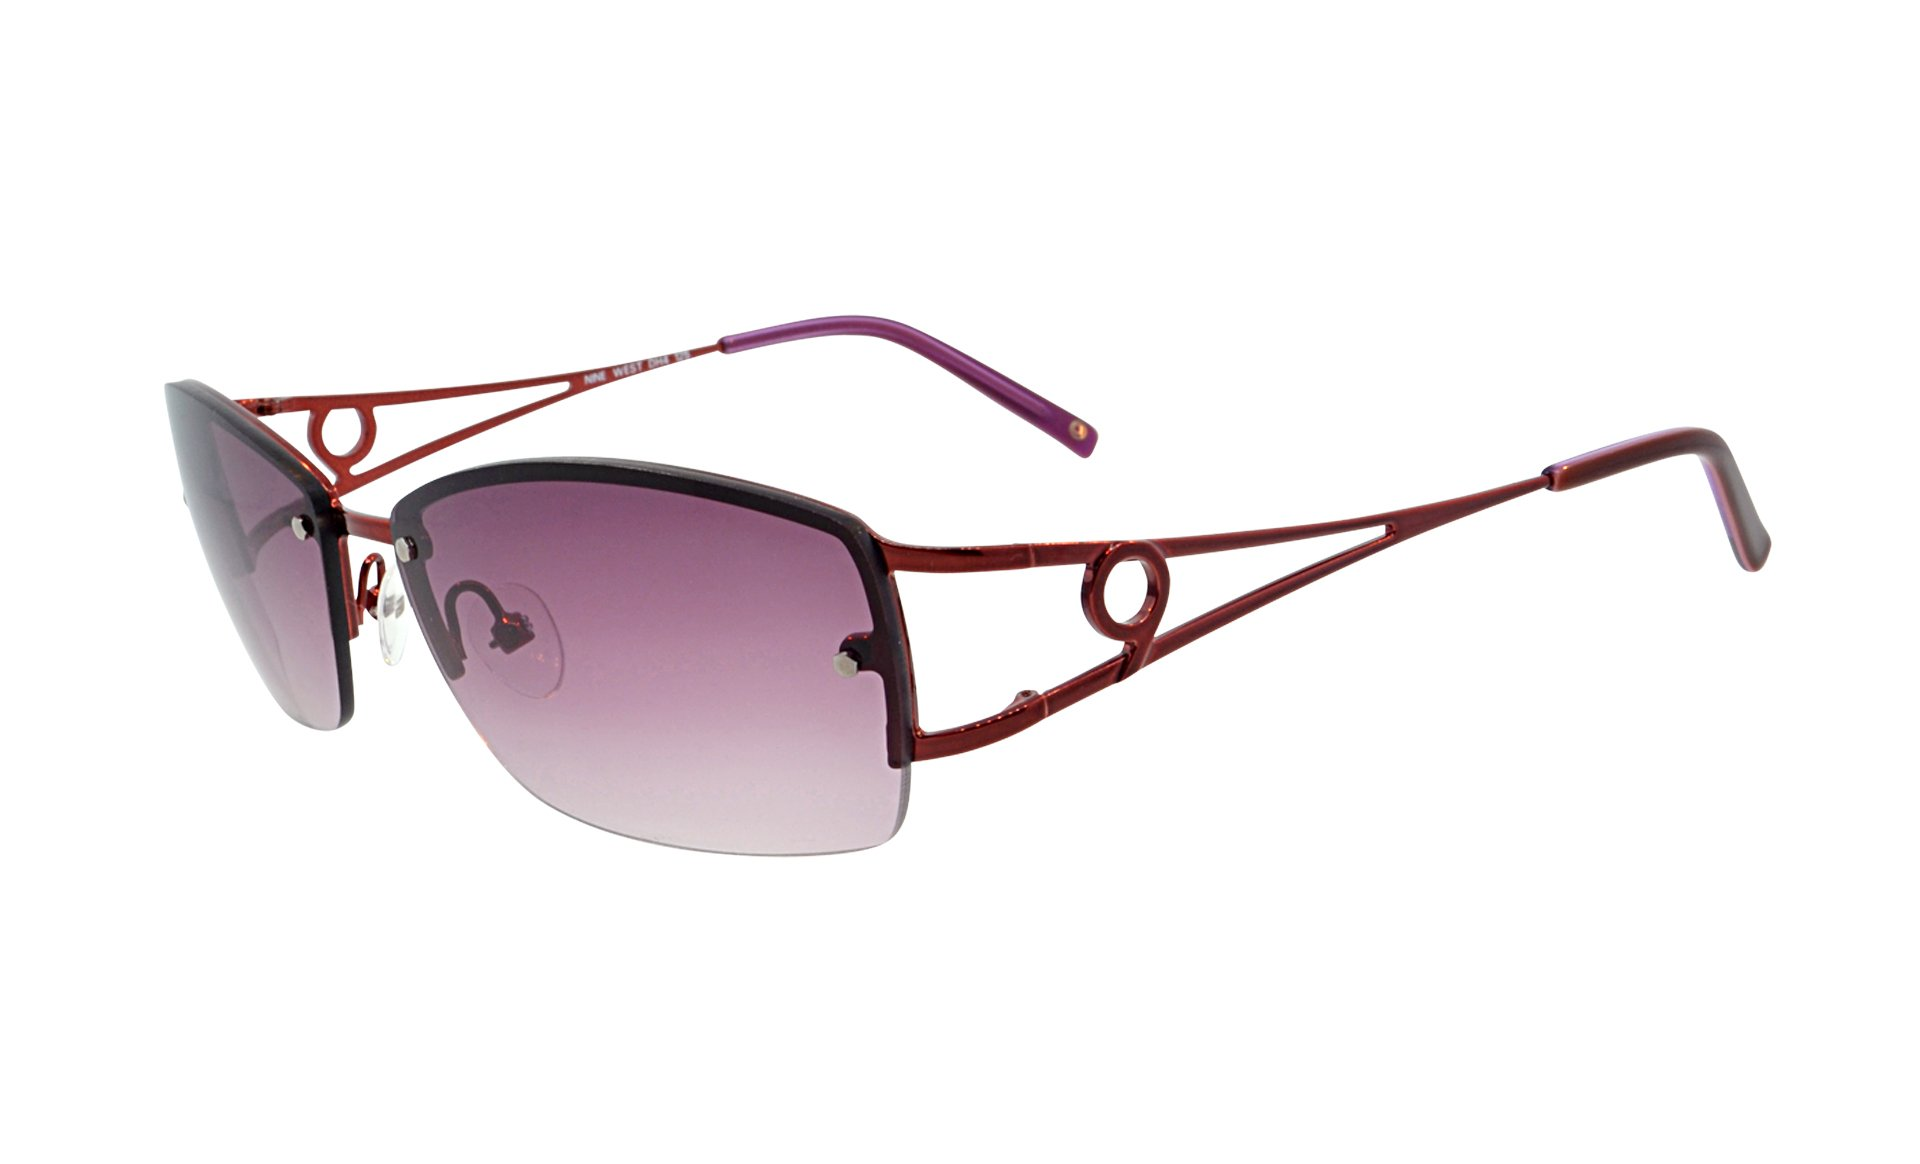 Nine West RAVISHING/S Sunglasses - 0DH4(B2) BORDEAUX BERRY